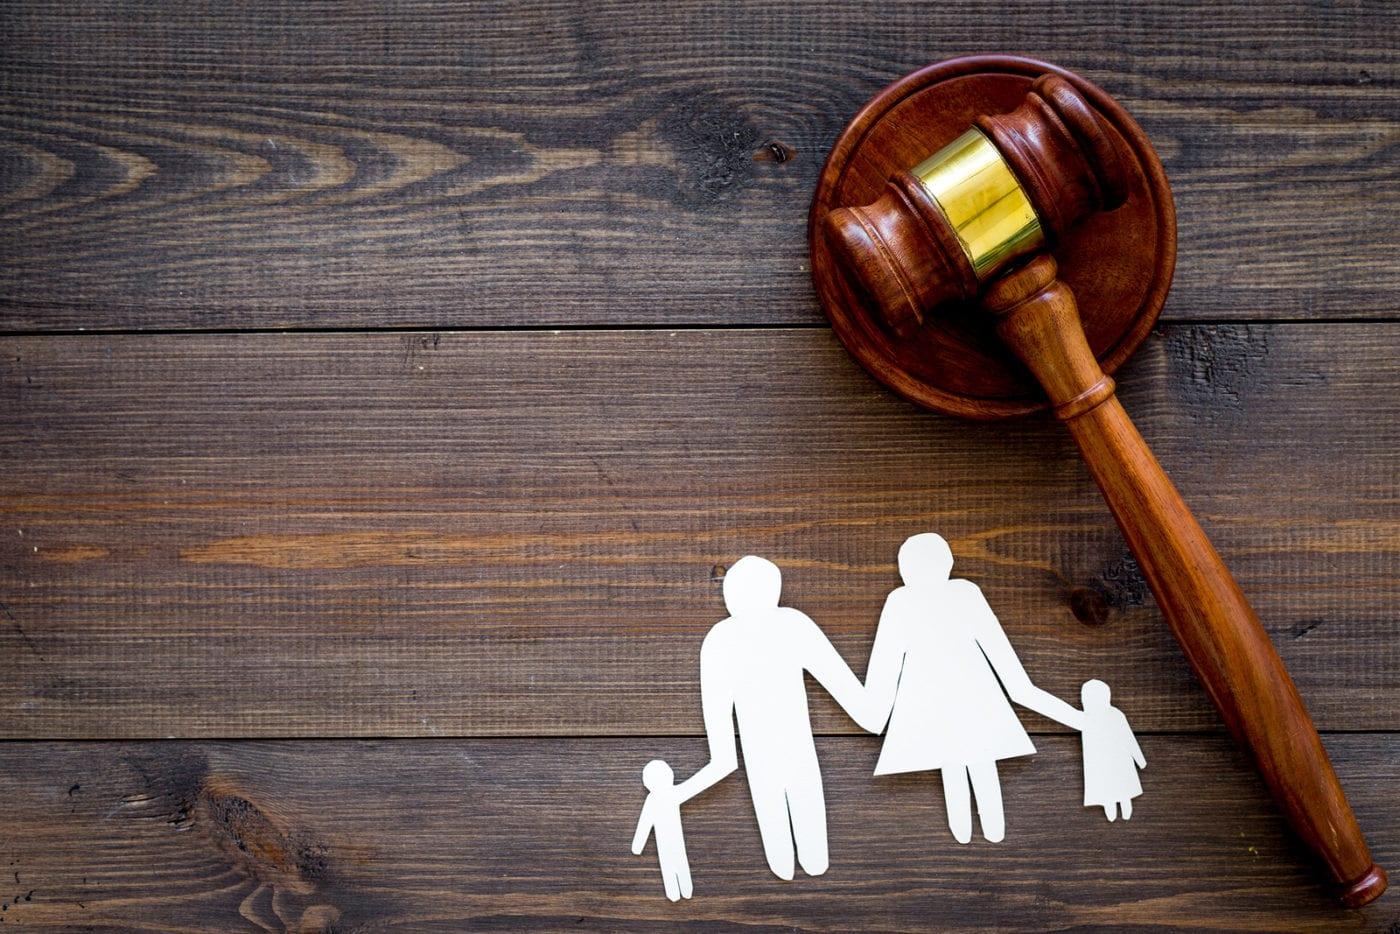 Aile Hukuku Mevzuatı Nedir?